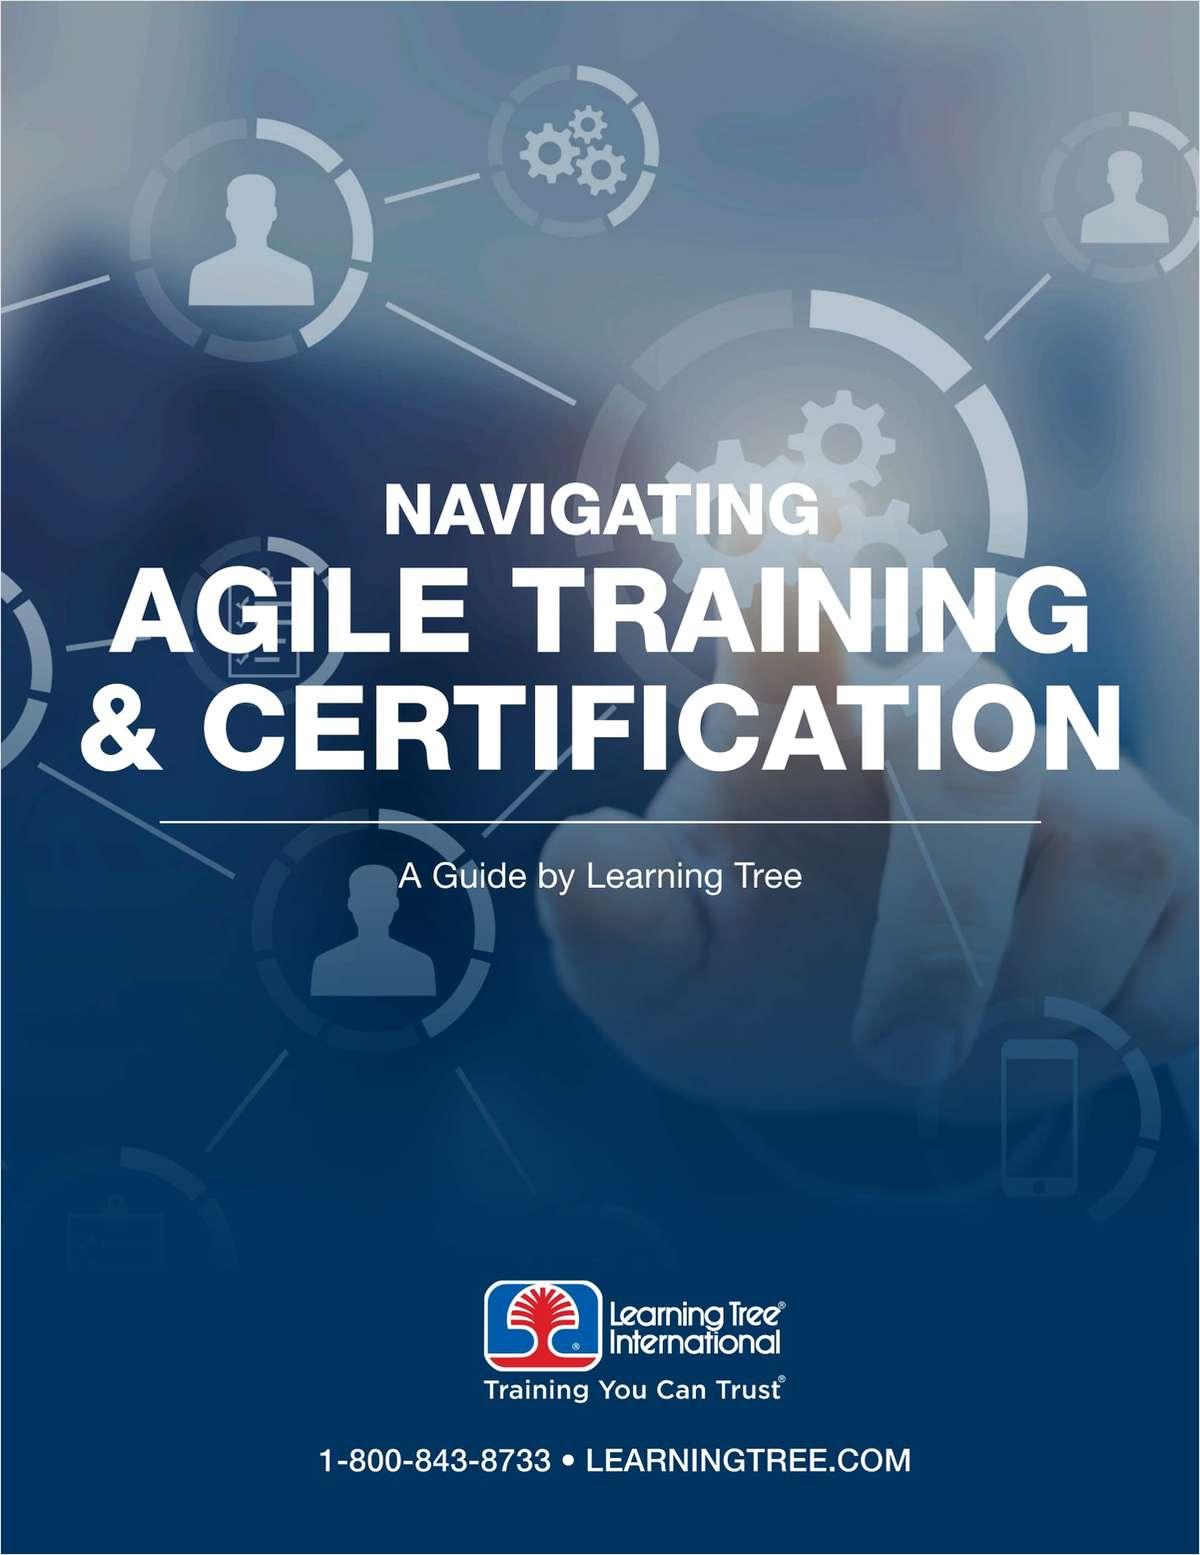 Navigating Agile Training & Certification